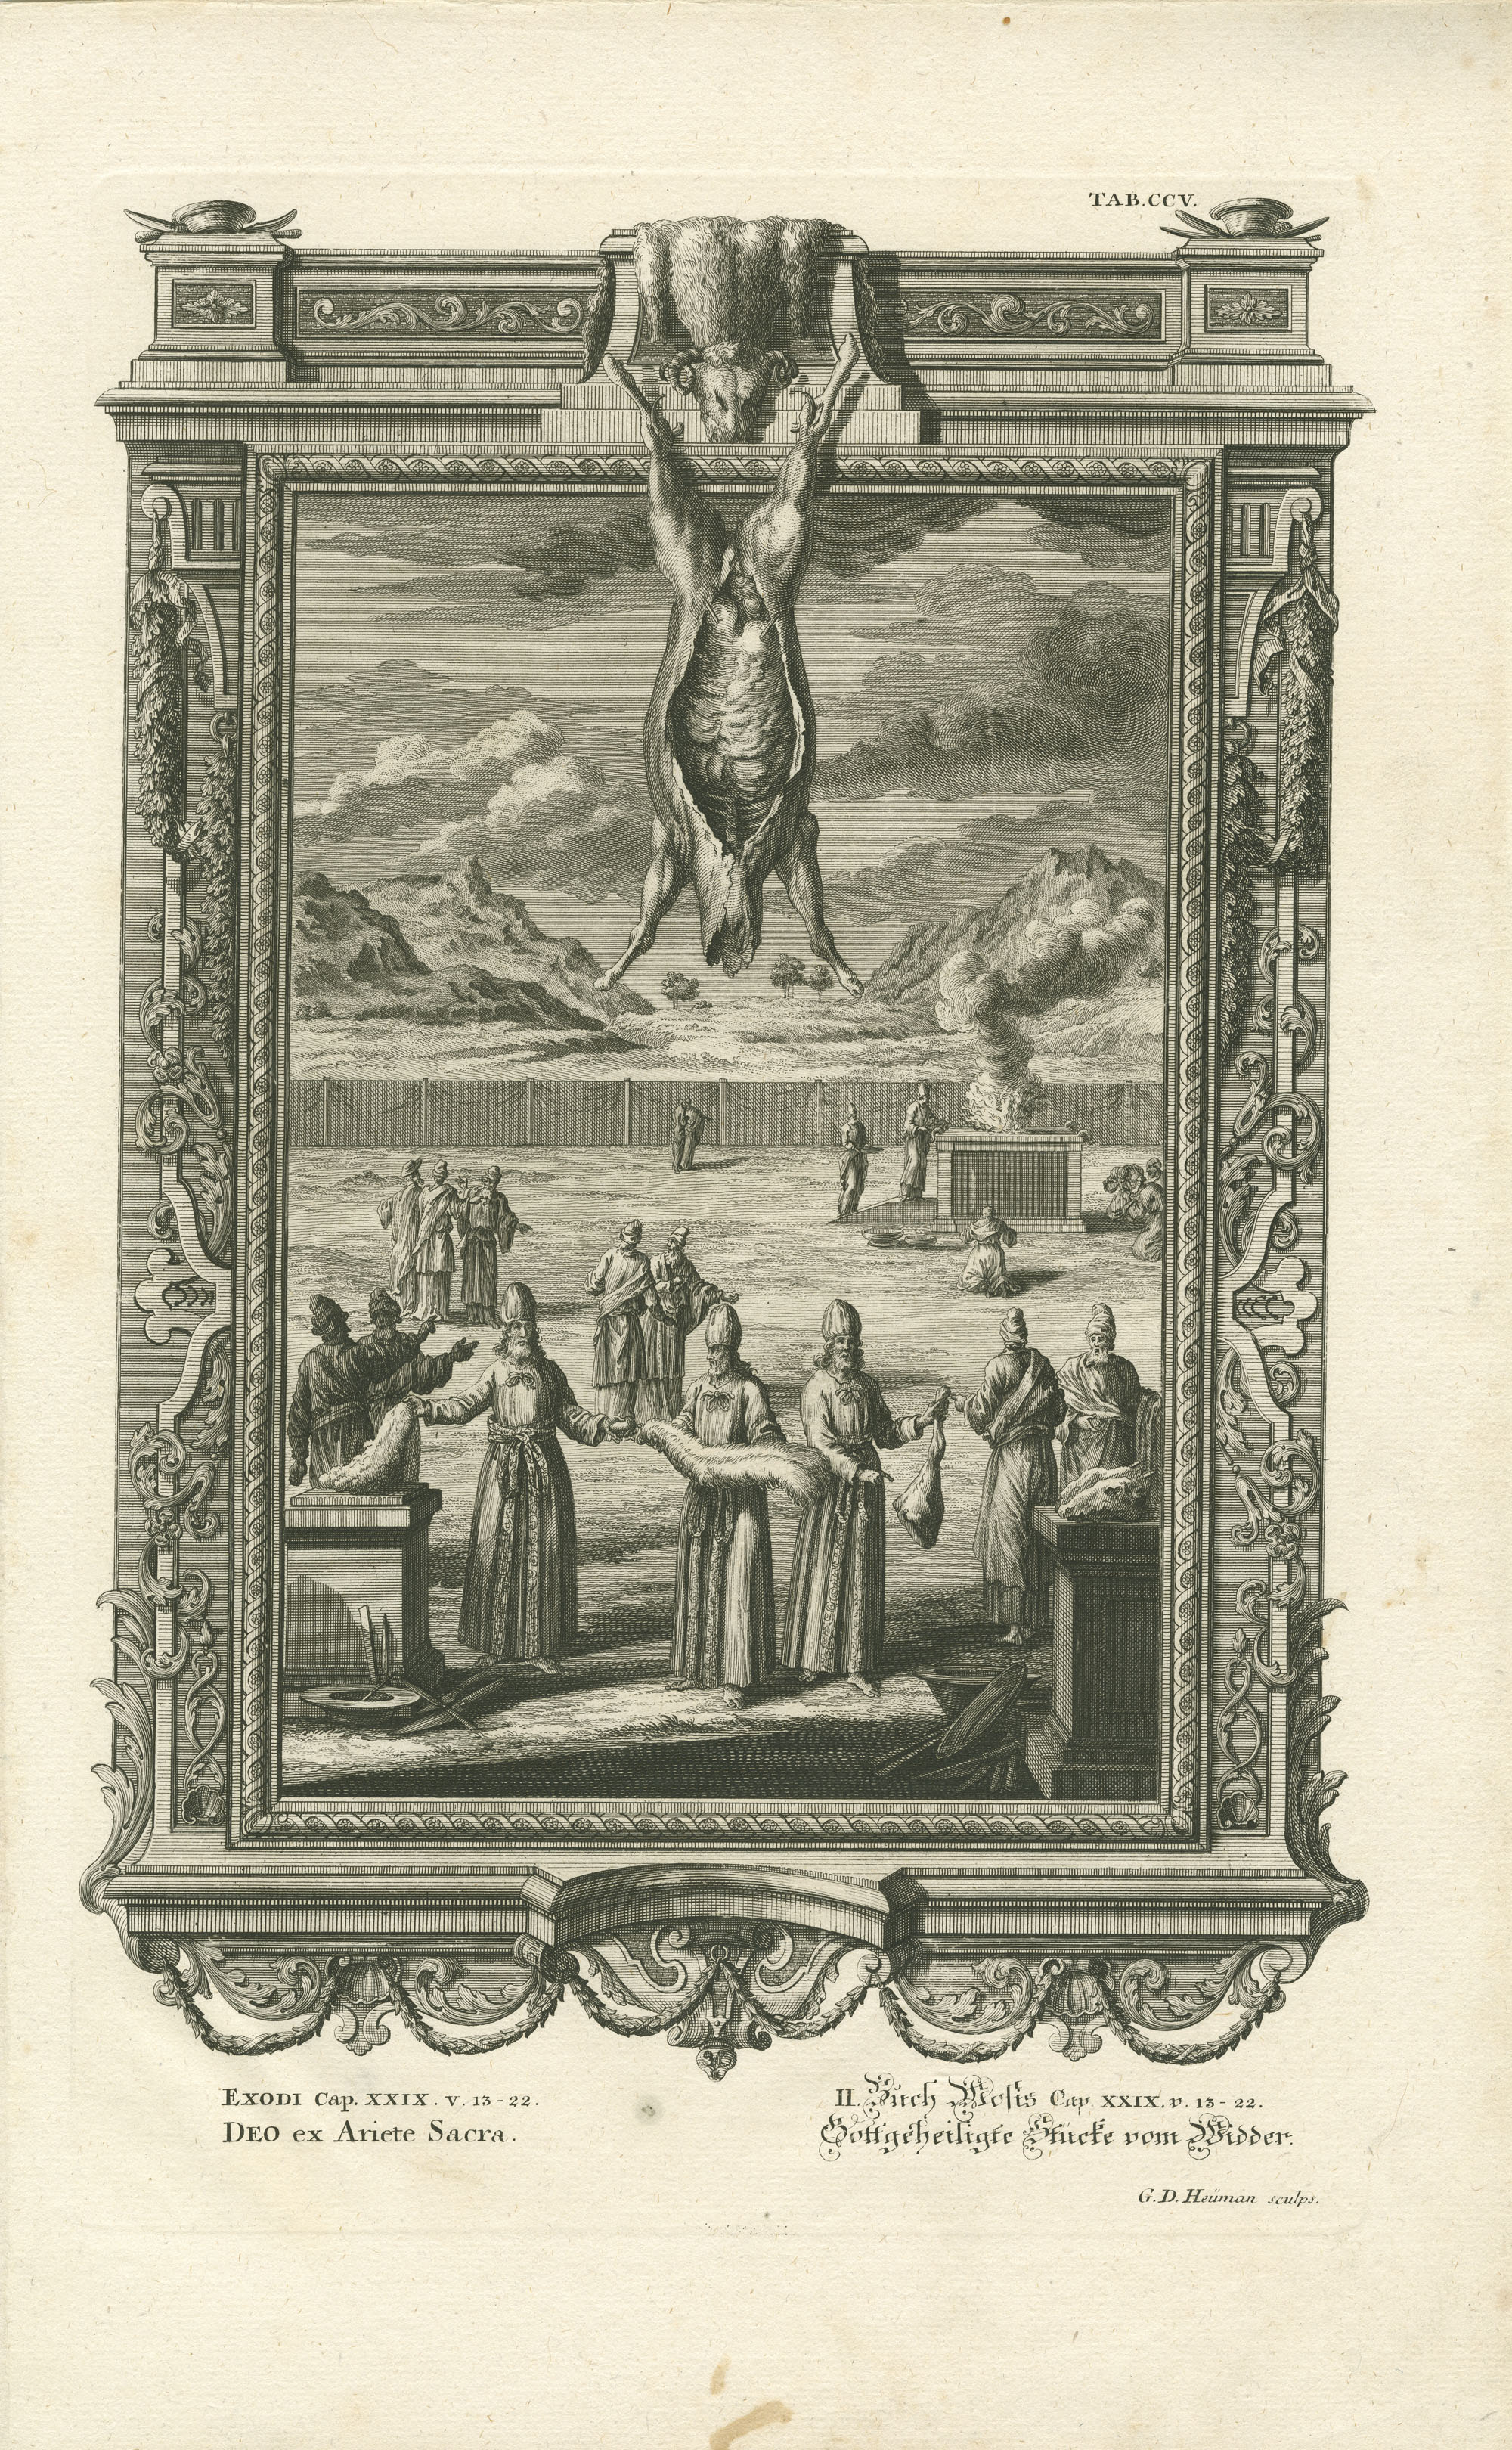 Exodi Cap. XXIX v. 13-22 Deo ex Ariete Sacra / II. Buch Mosis Cap. XXIX v. 13-22 Gottgeheiligte Stücke vom Widder